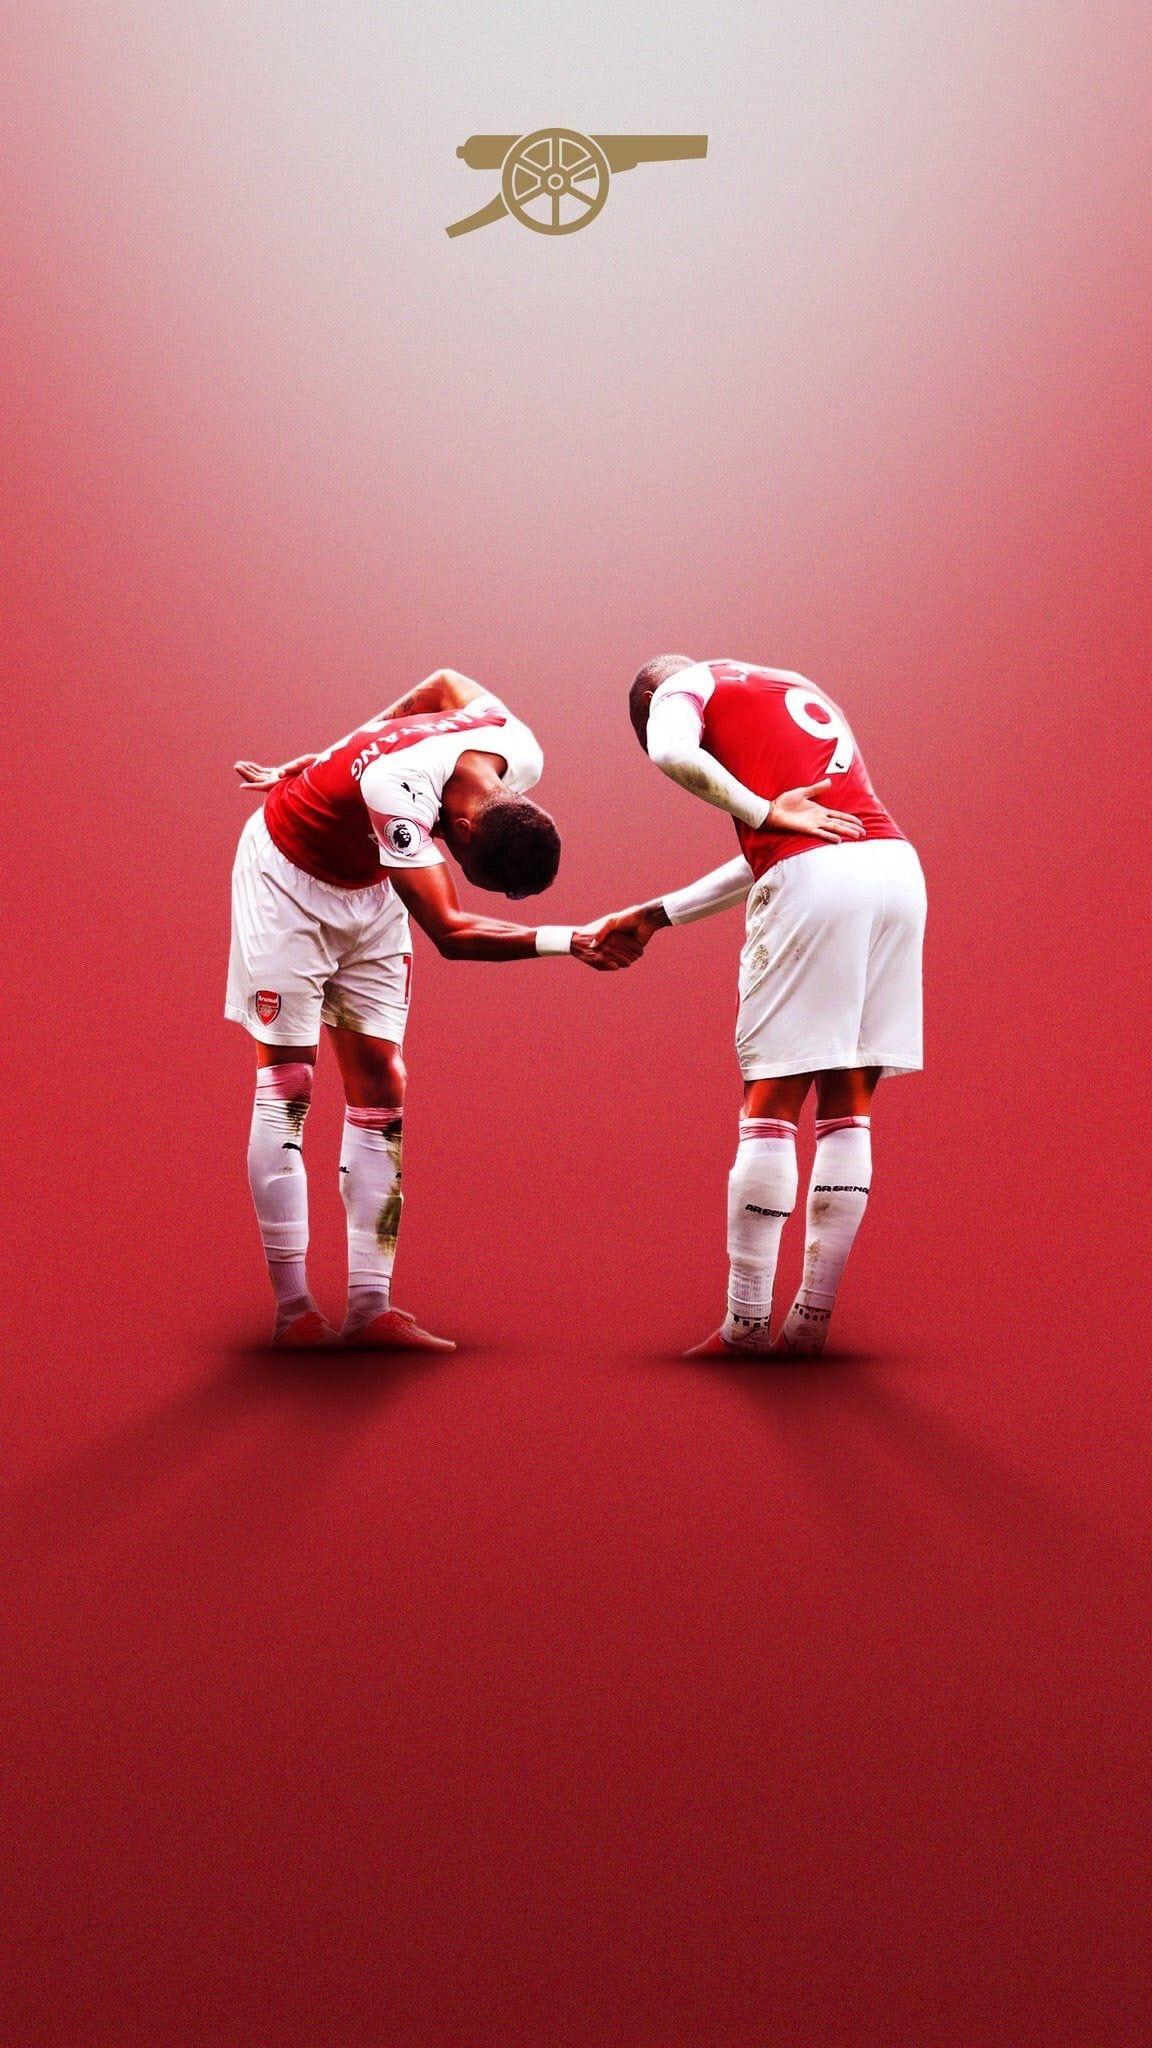 26+ Arsenal 2019 Wallpapers on WallpaperSafari